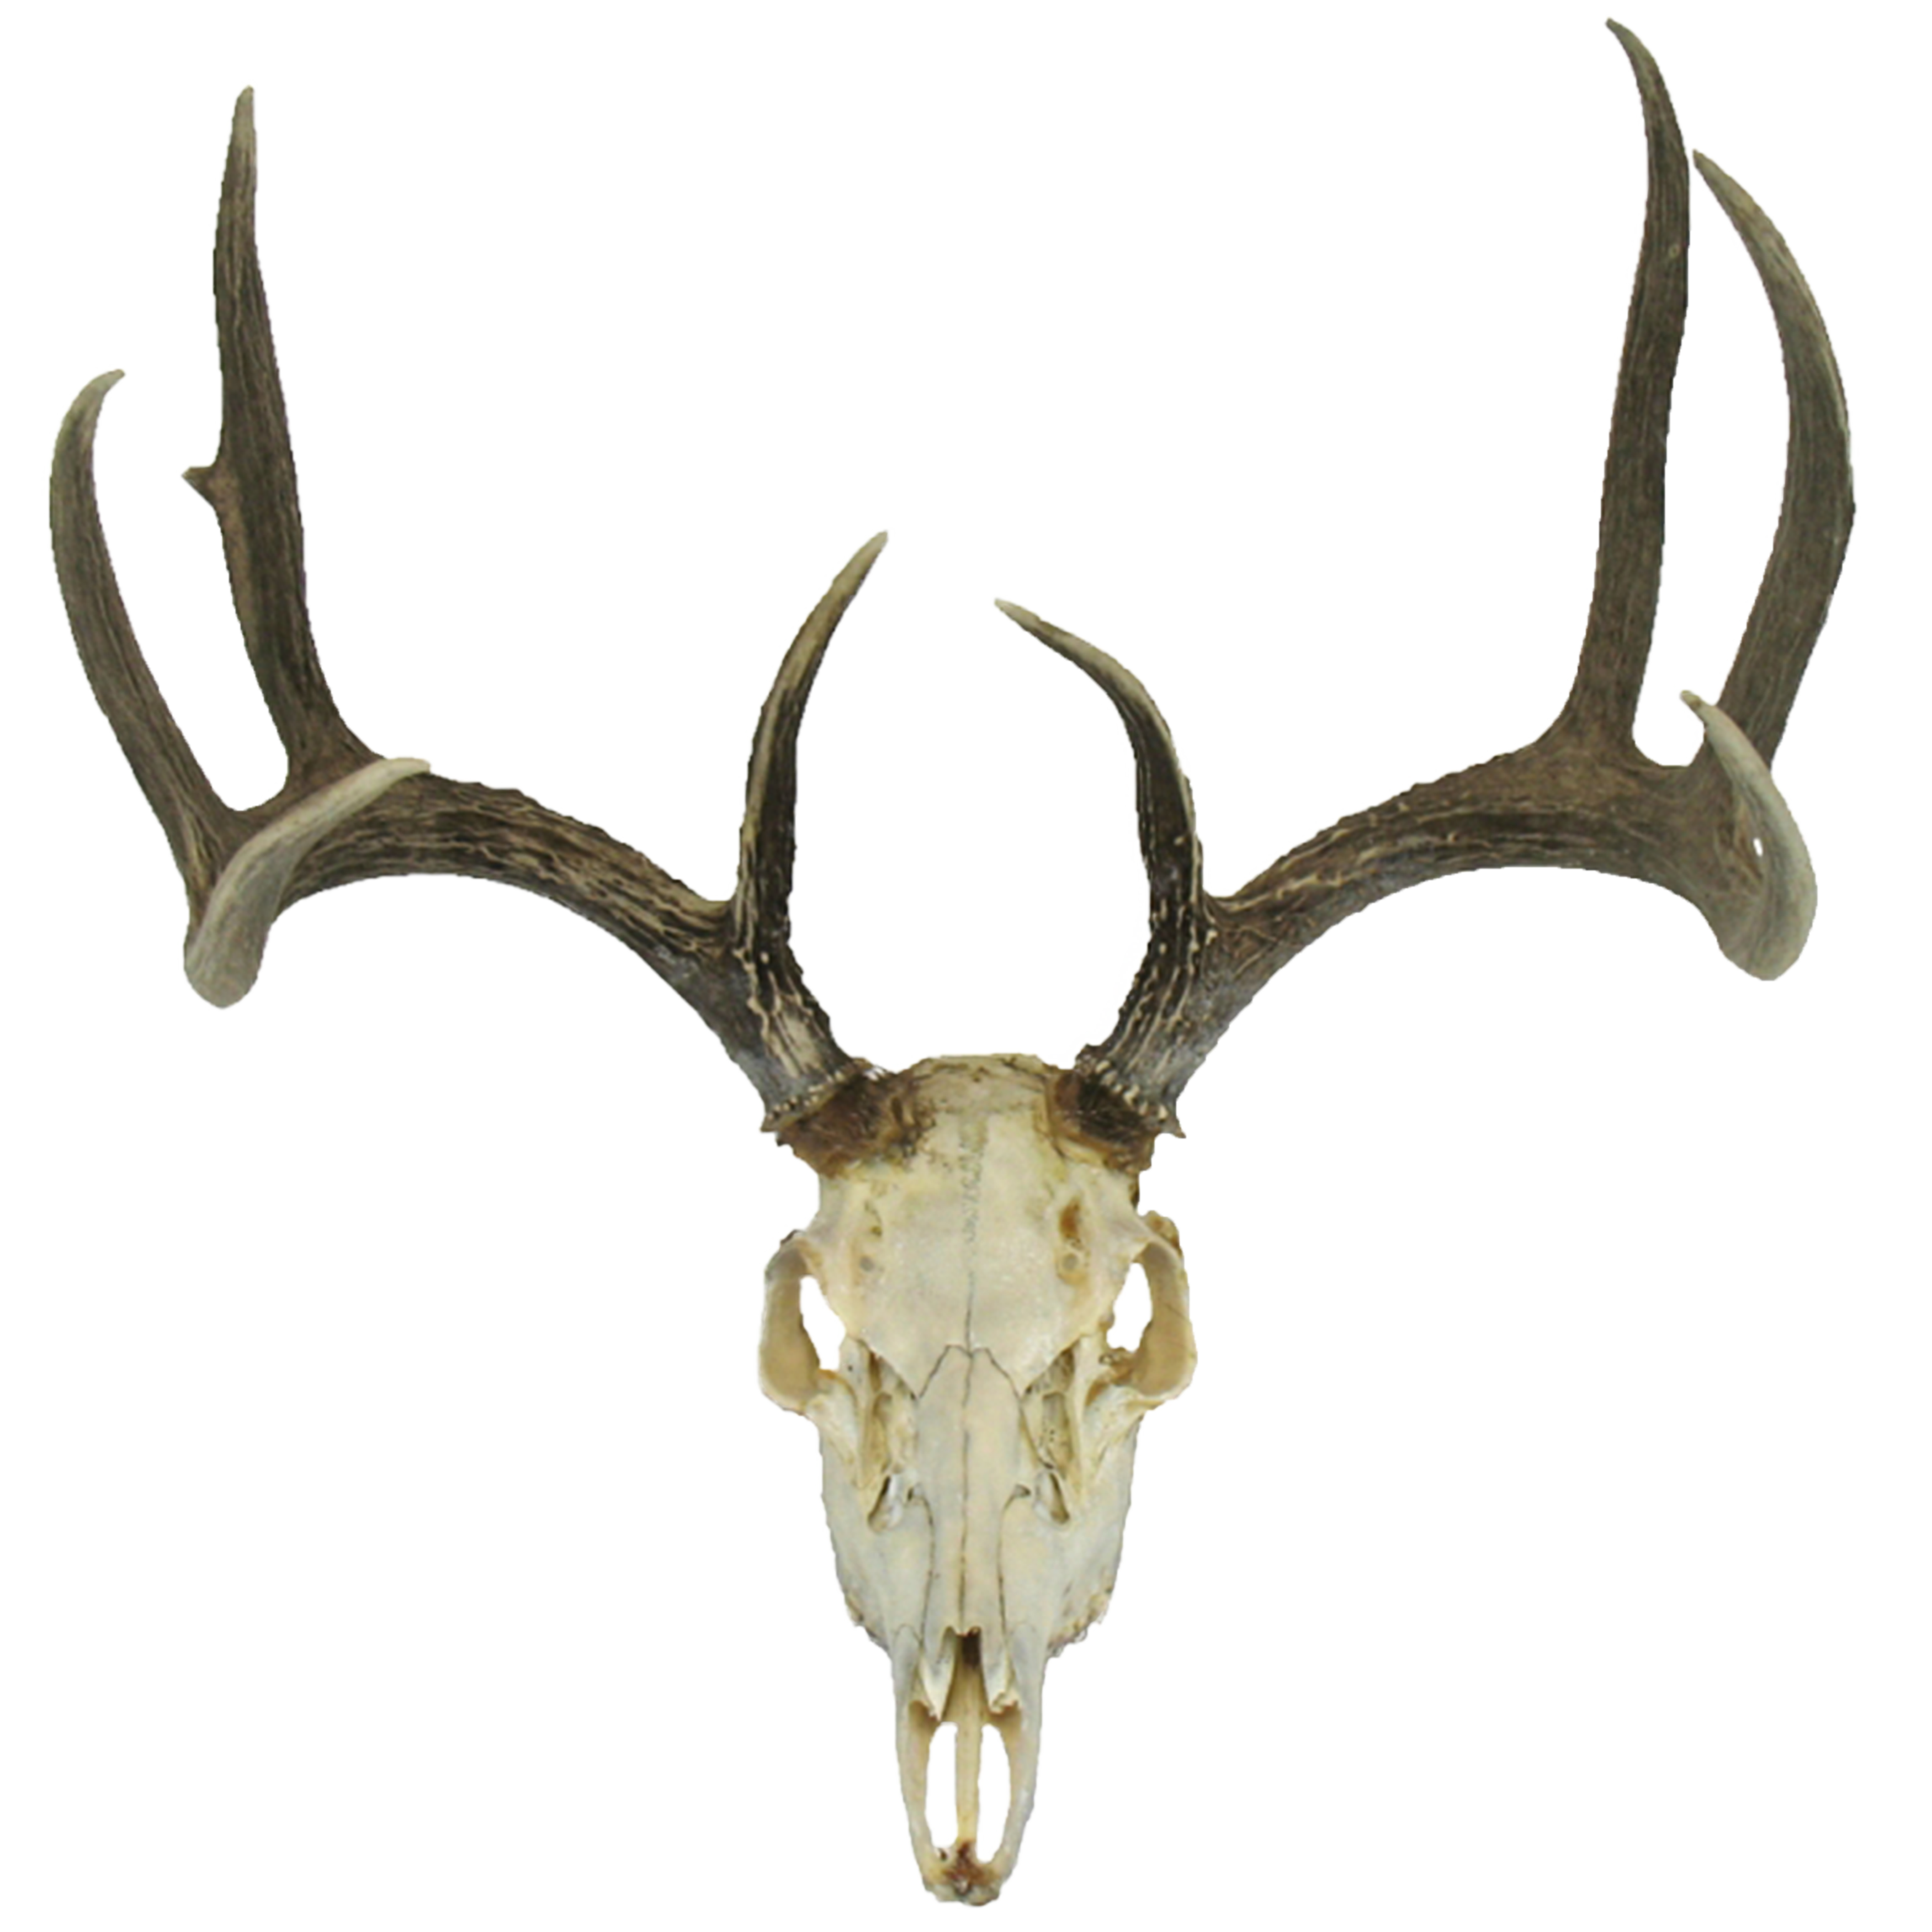 Sq Buck Skull 1 Png 3 500 3 500 Pixels Deer Skulls Deer Skull Drawing Deer Mask